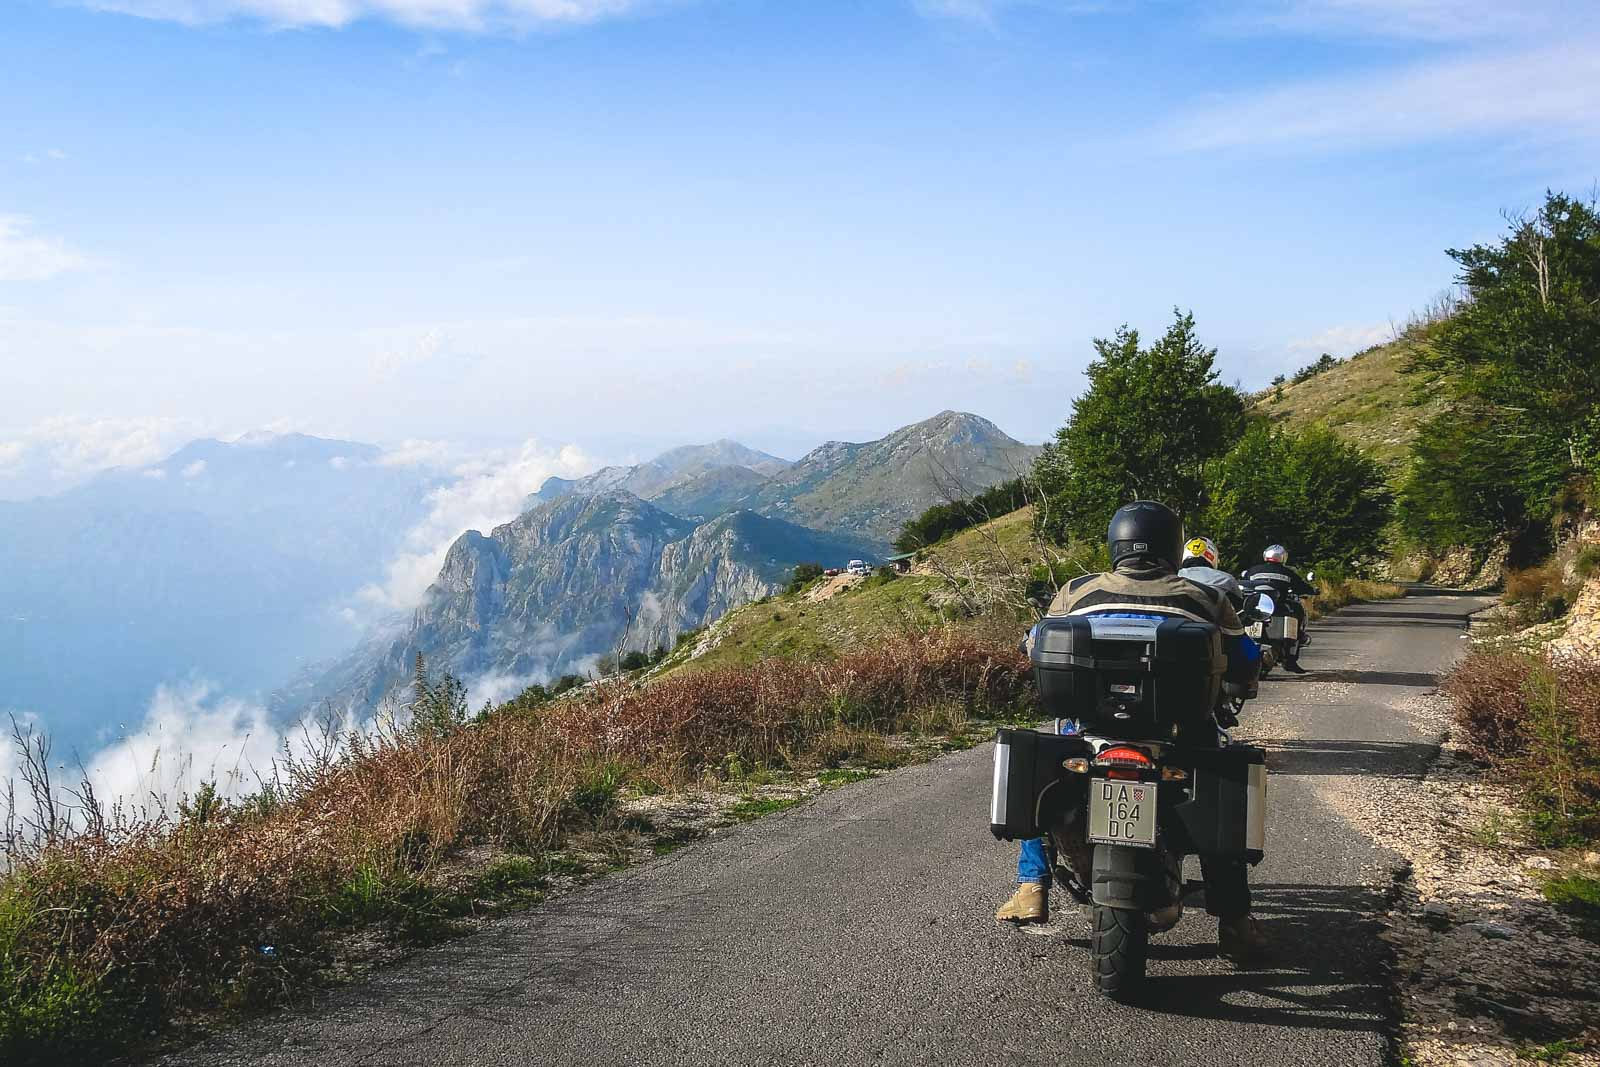 overlook-adriatic-sea-croatia-motorcycling-europe